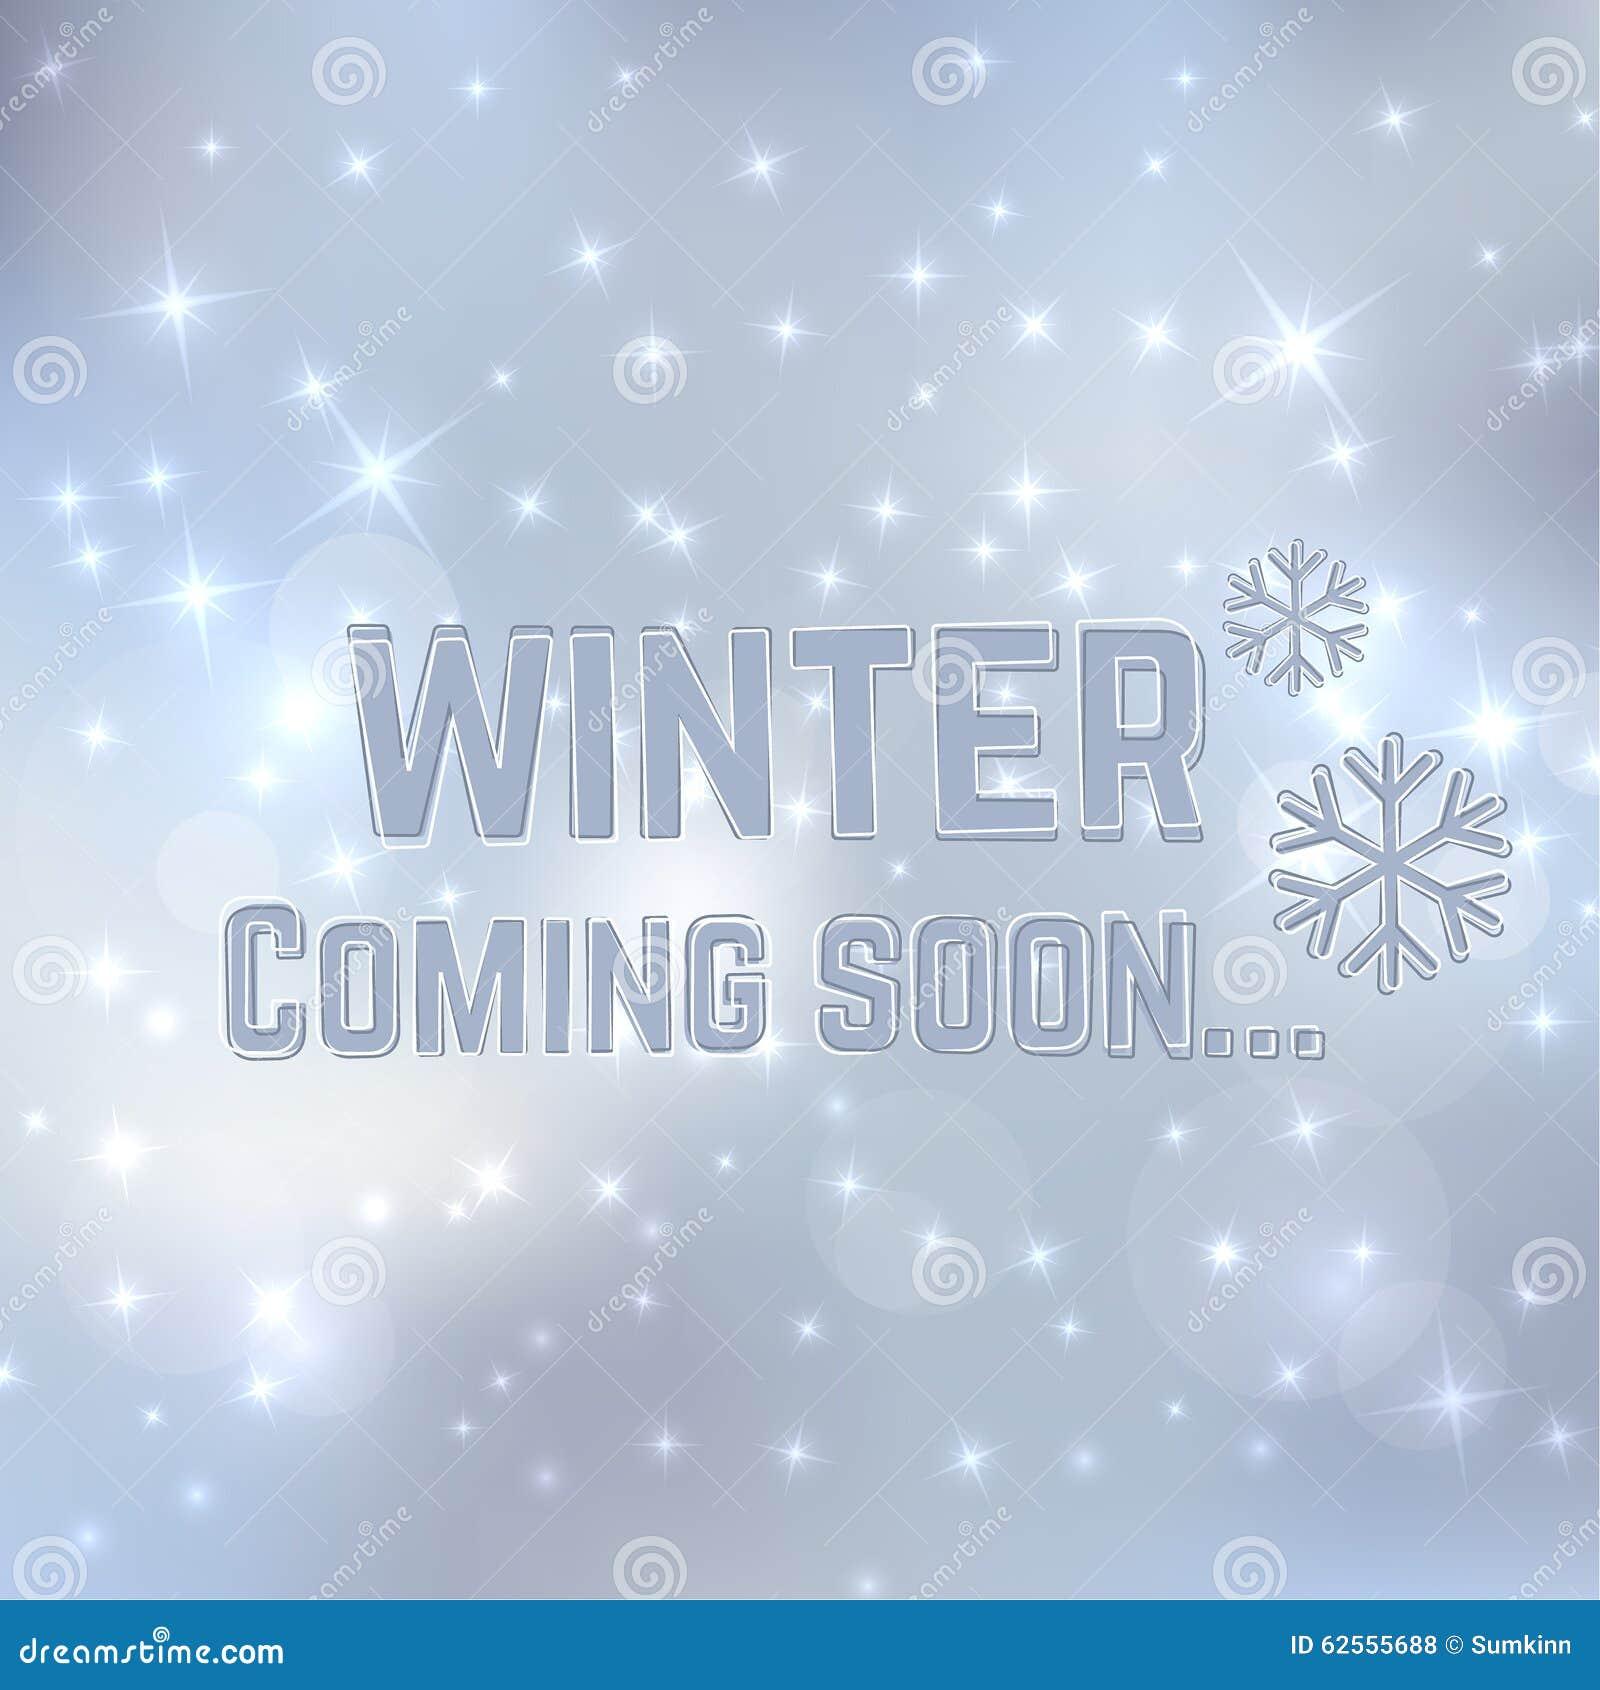 Winter Coming Soon Stock Vector Illustration Of Advertising 62555688